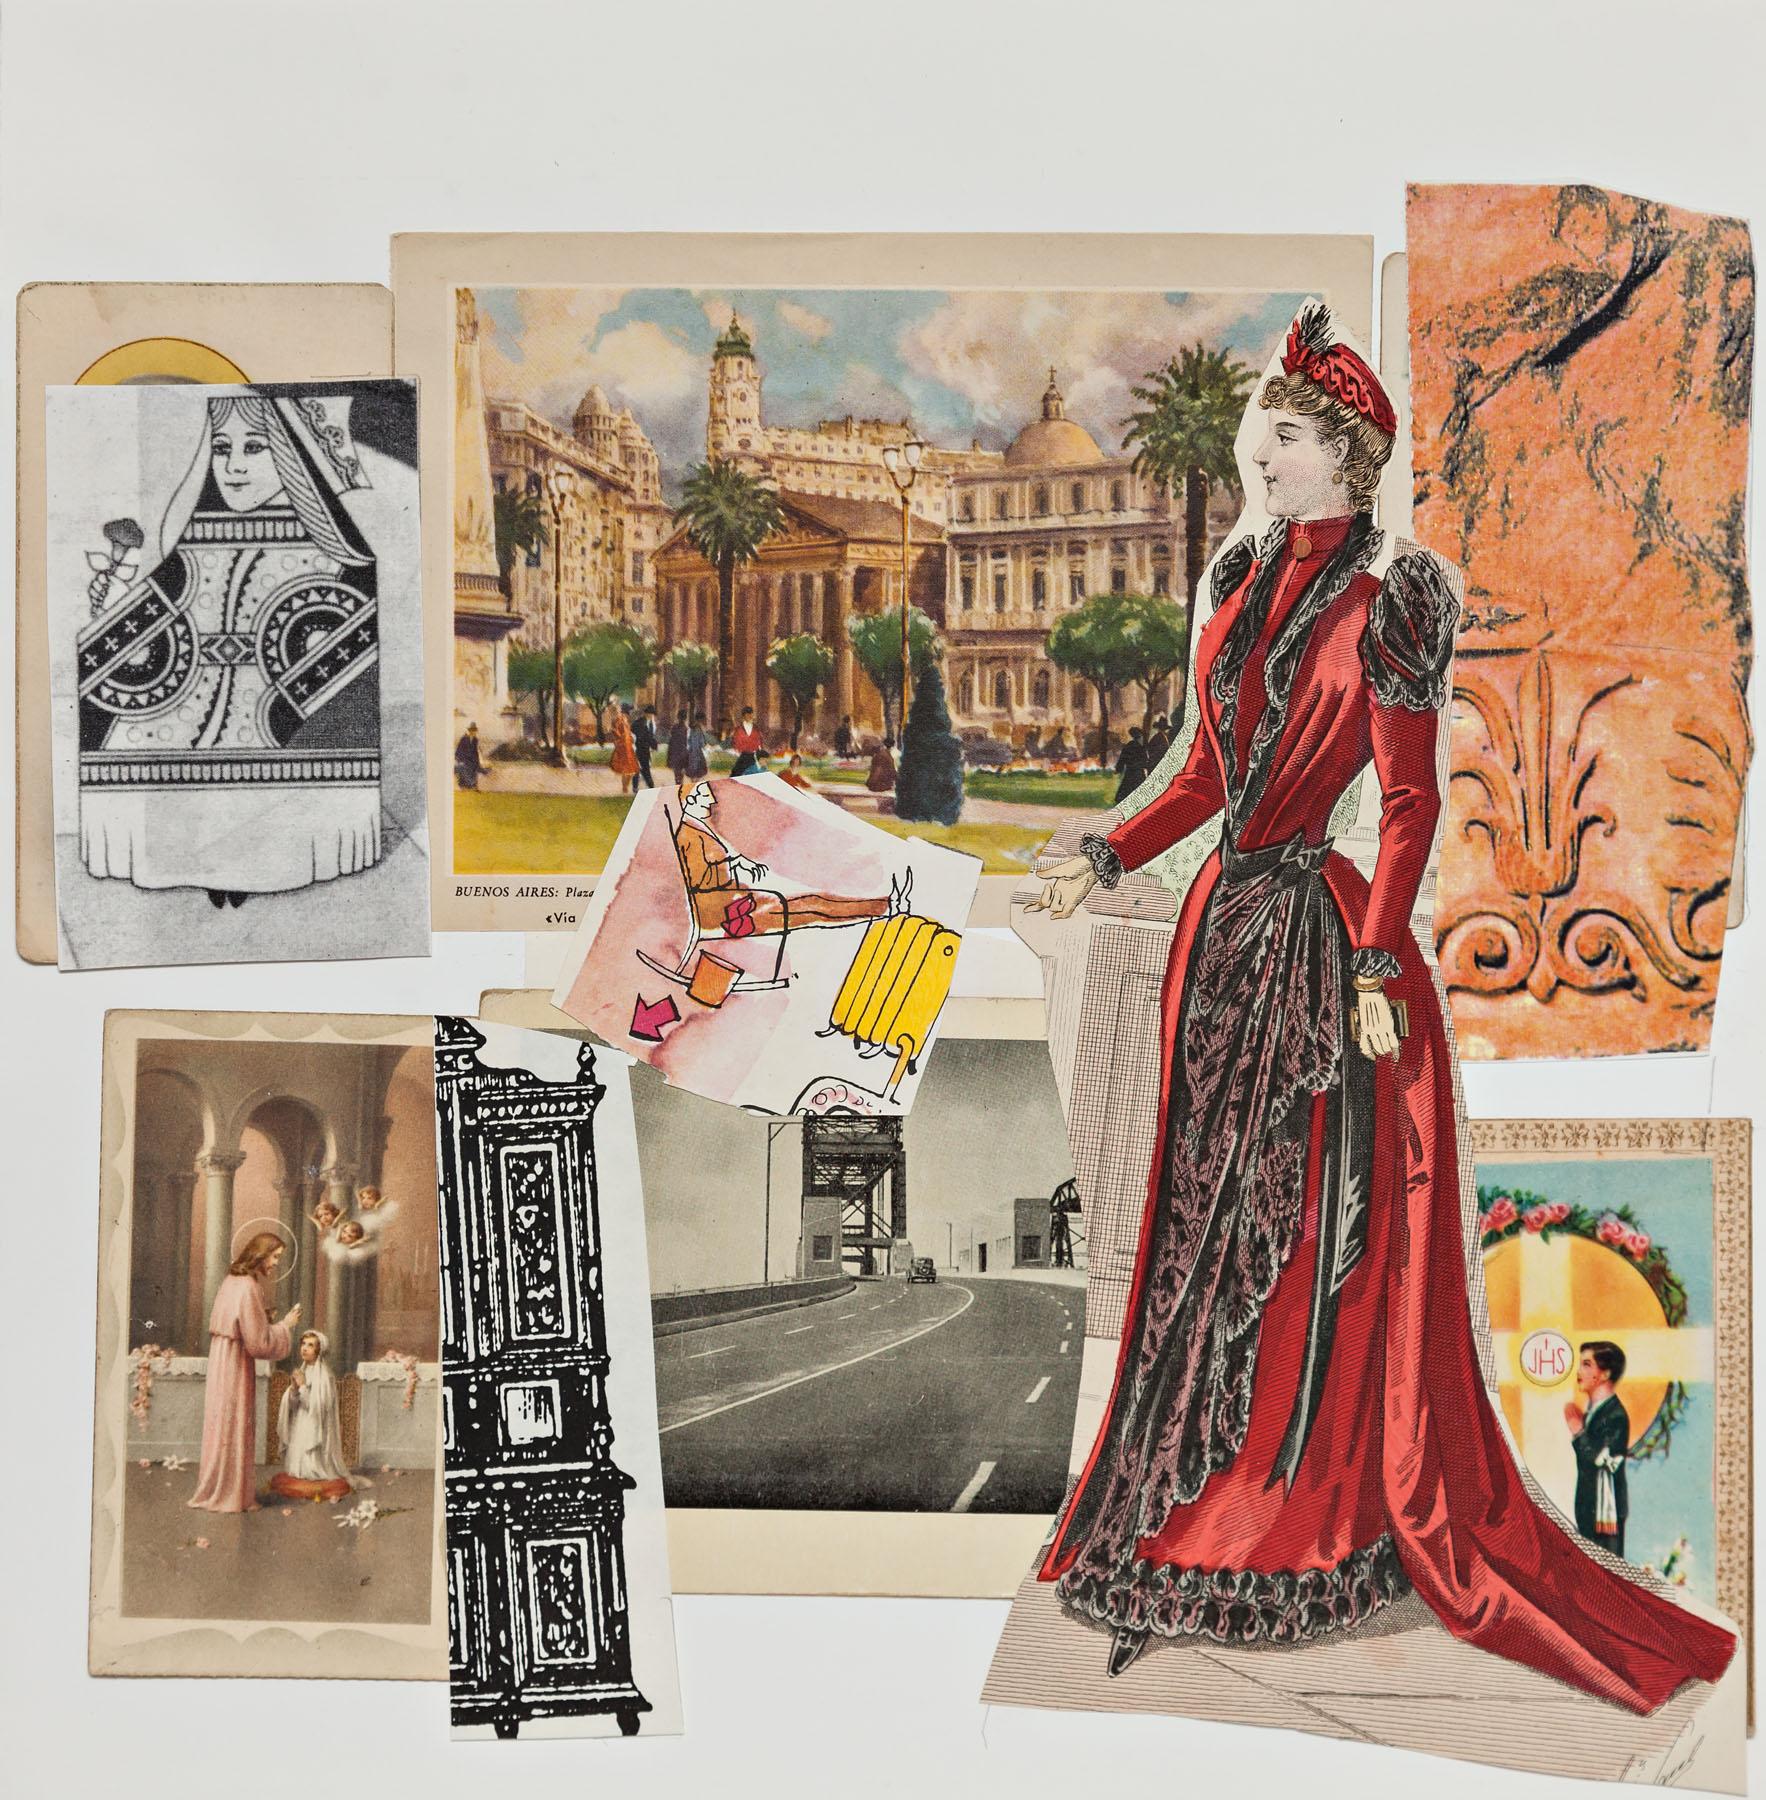 Serie Cuarentena, papel collage, 28 cm x 27 cm, 2020